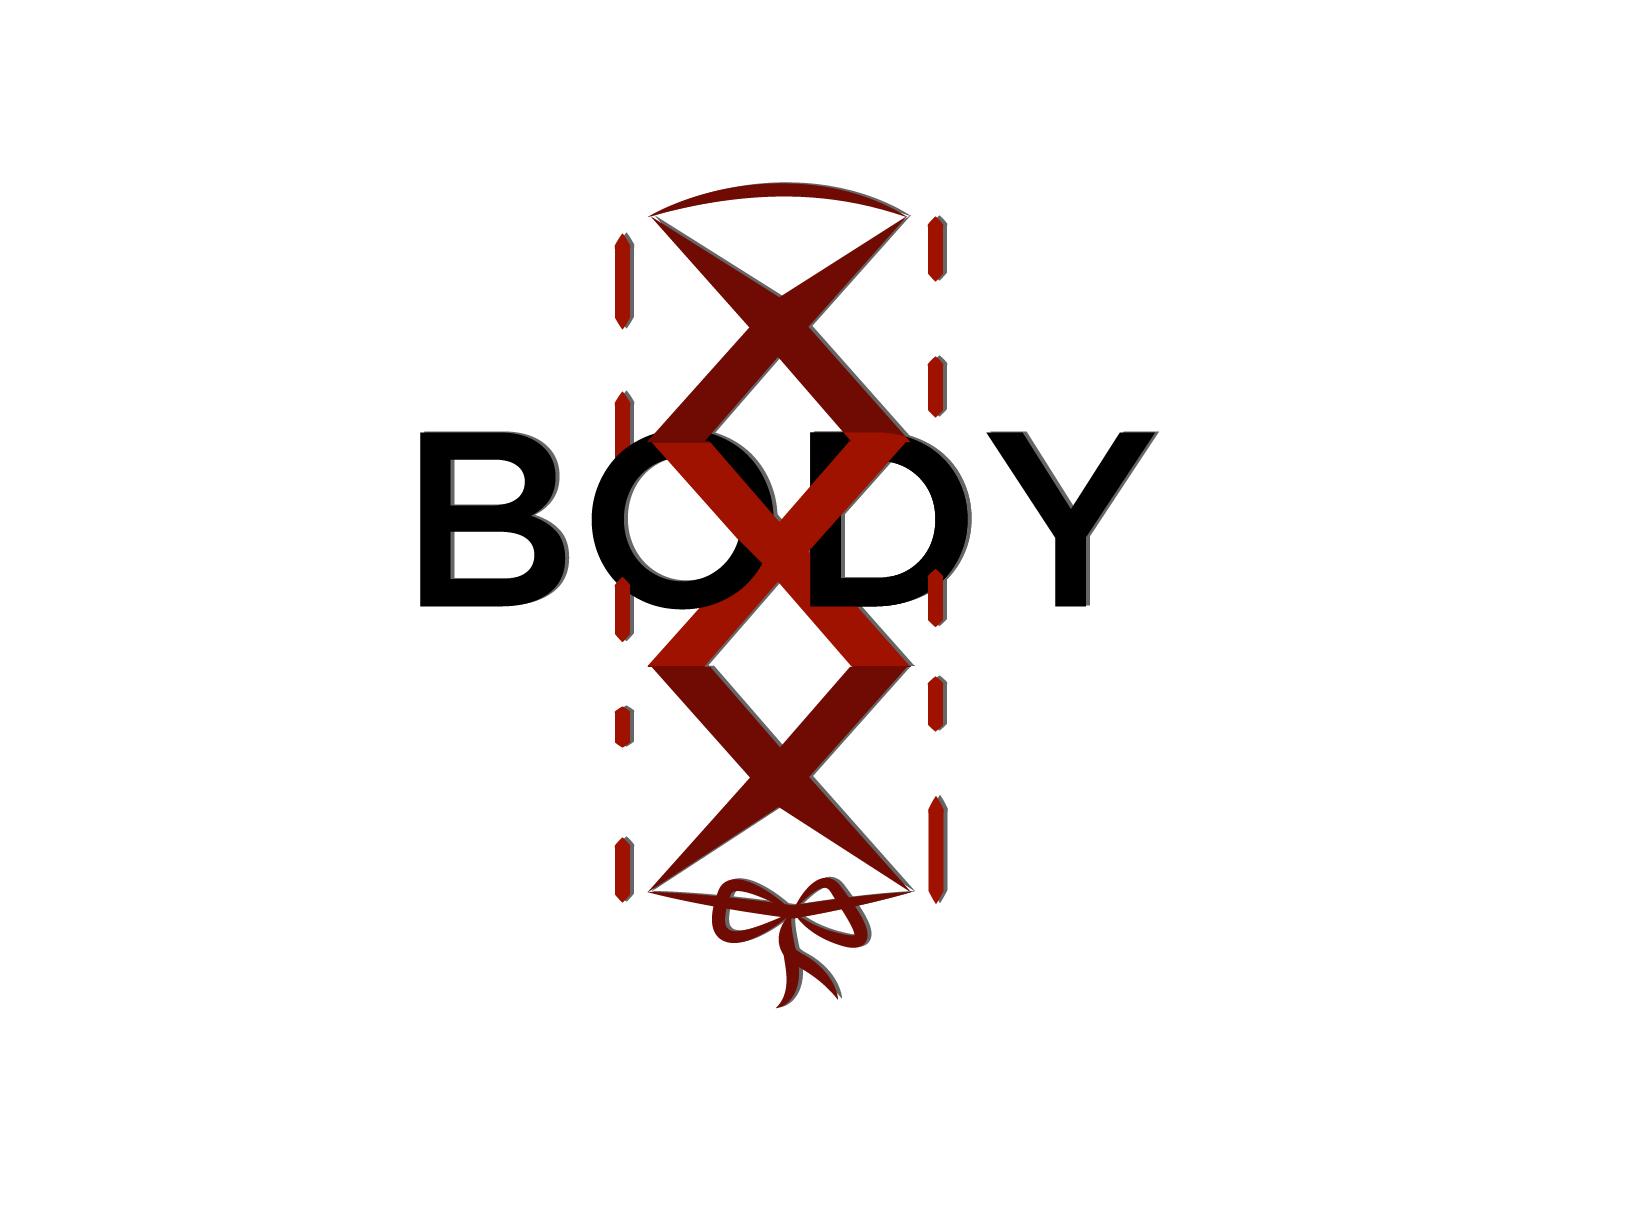 Разработка логотипа (видеоблог для моделей) фото f_7225b1efd0ce7203.png